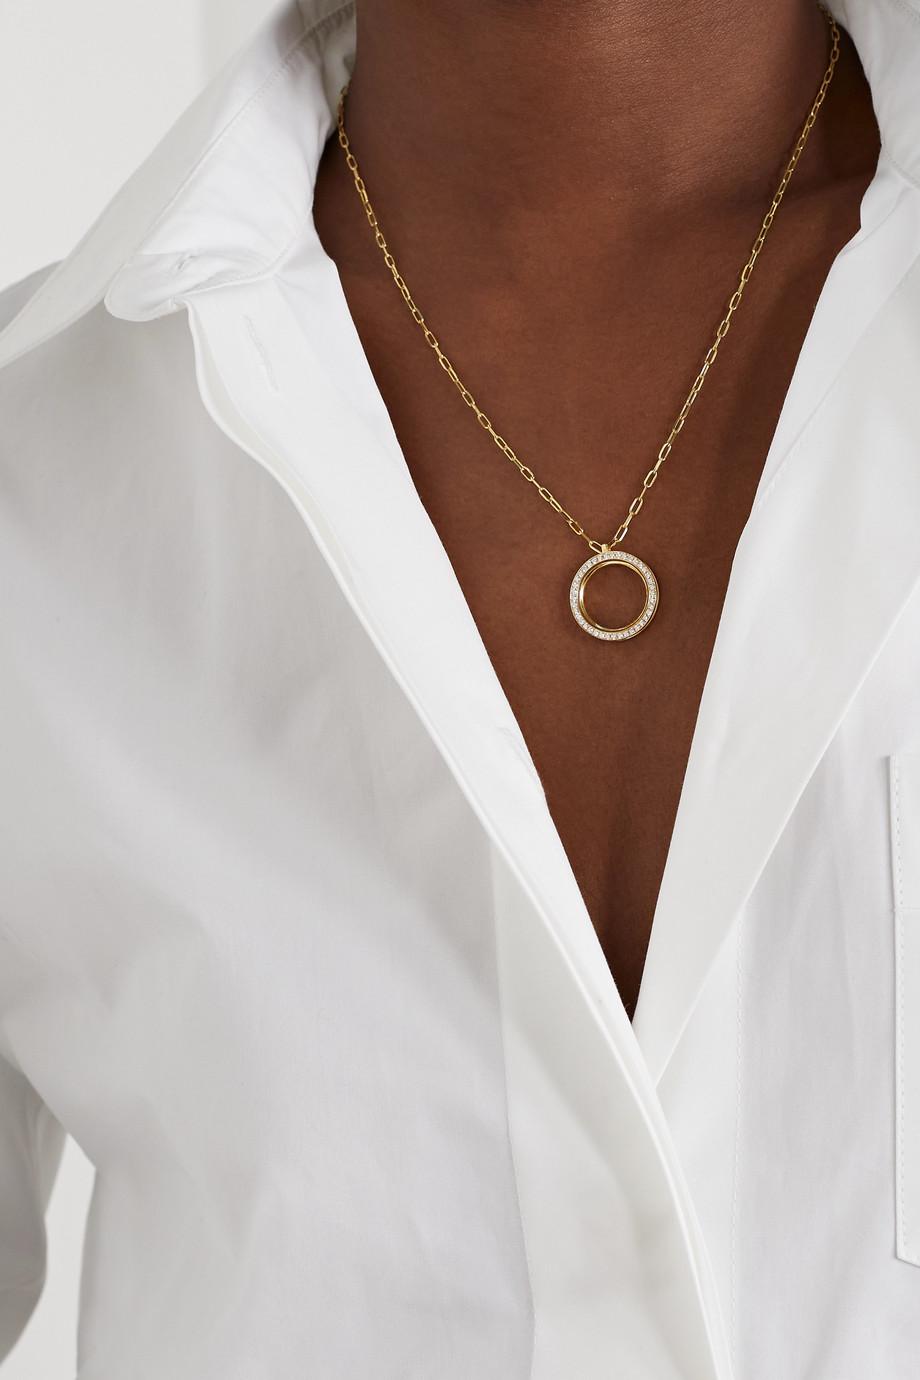 State Property George 18-karat gold, diamond and onyx necklace